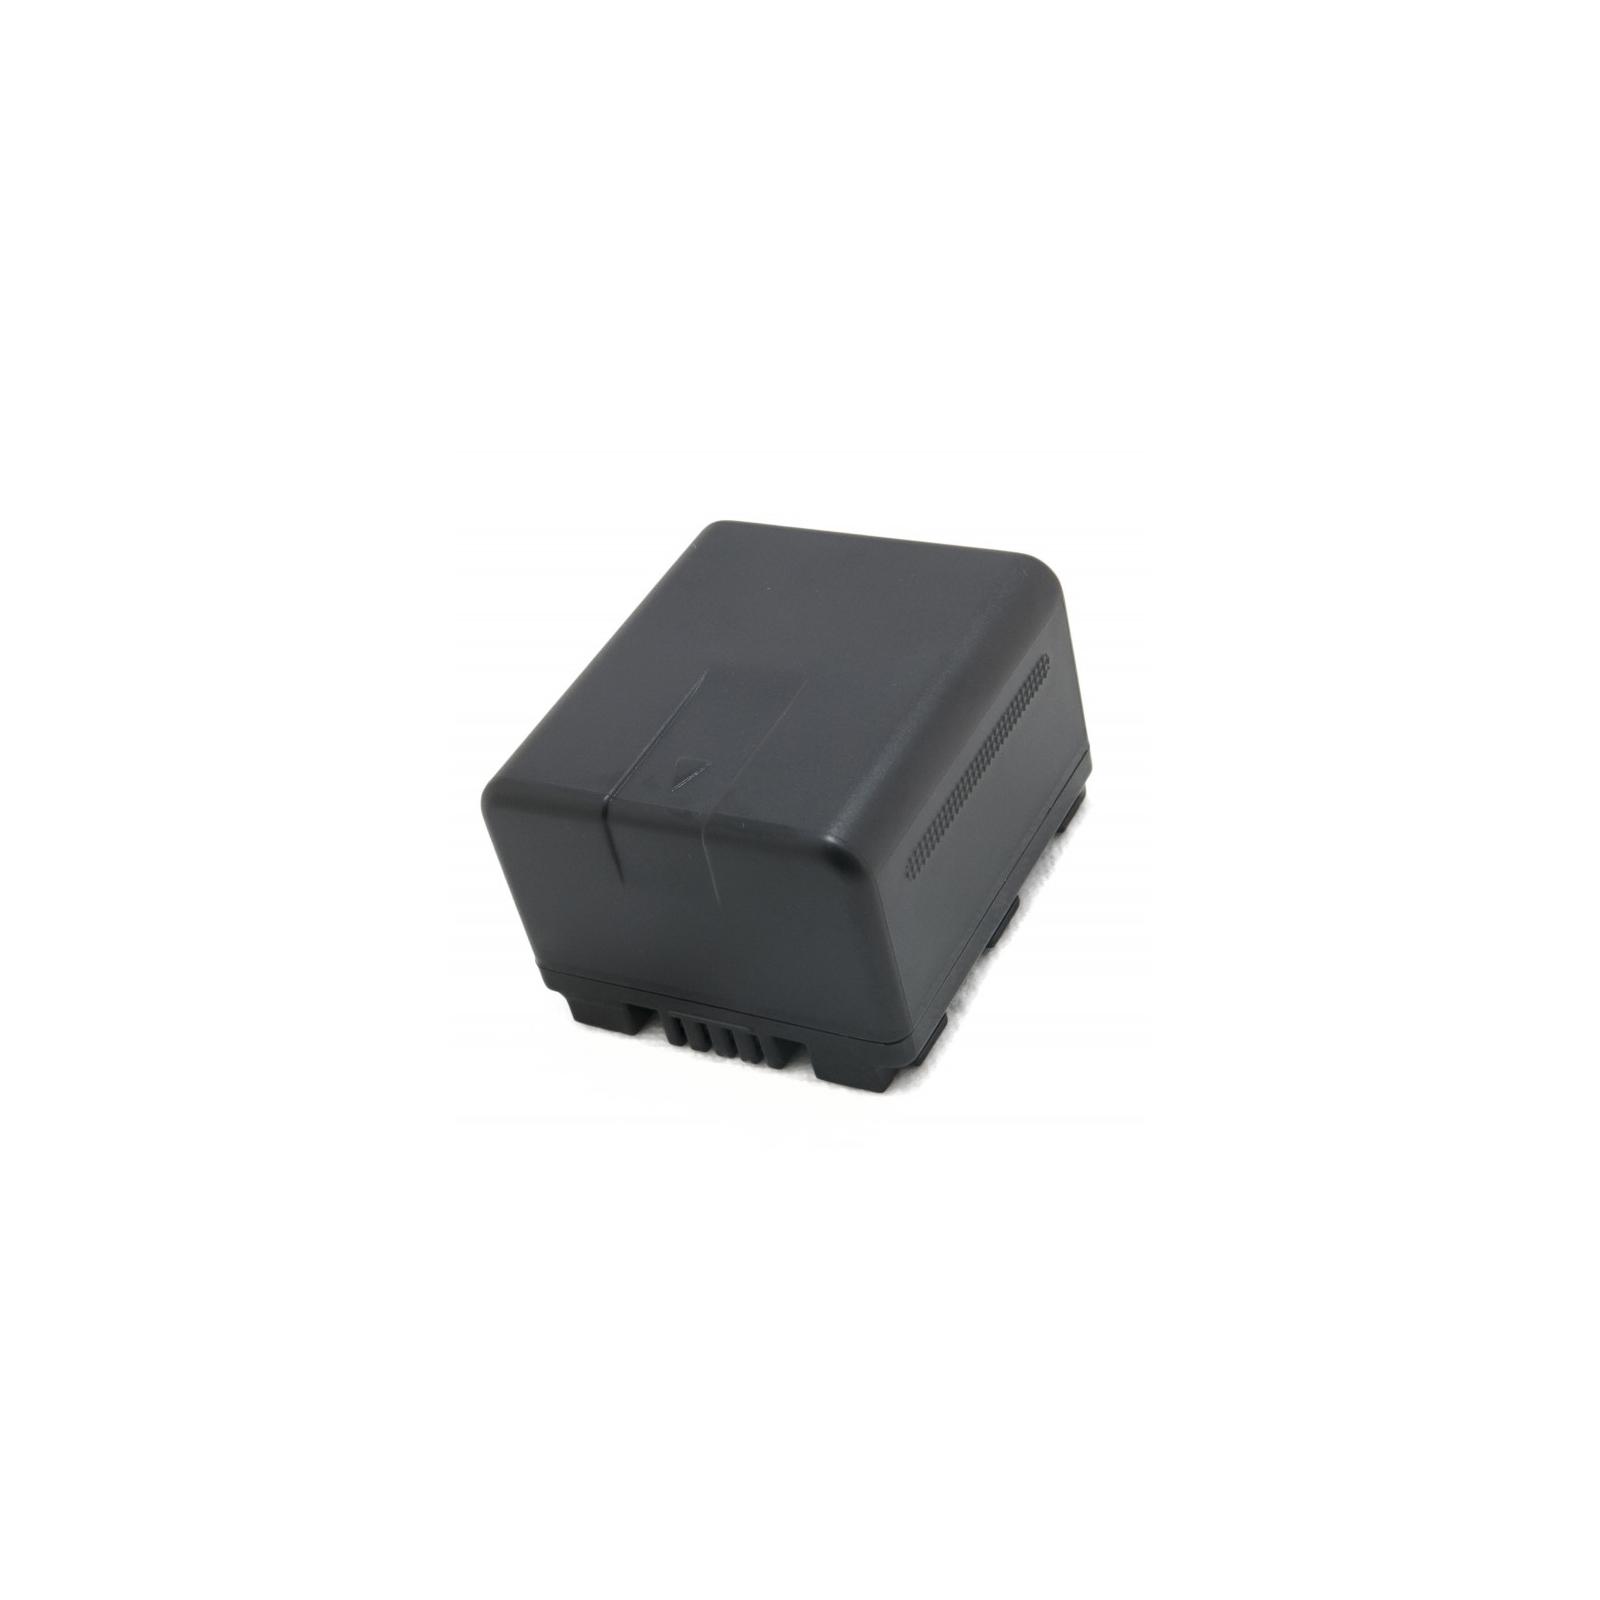 Аккумулятор к фото/видео EXTRADIGITAL Panasonic VW-VBN130 (DV00DV1361) изображение 5